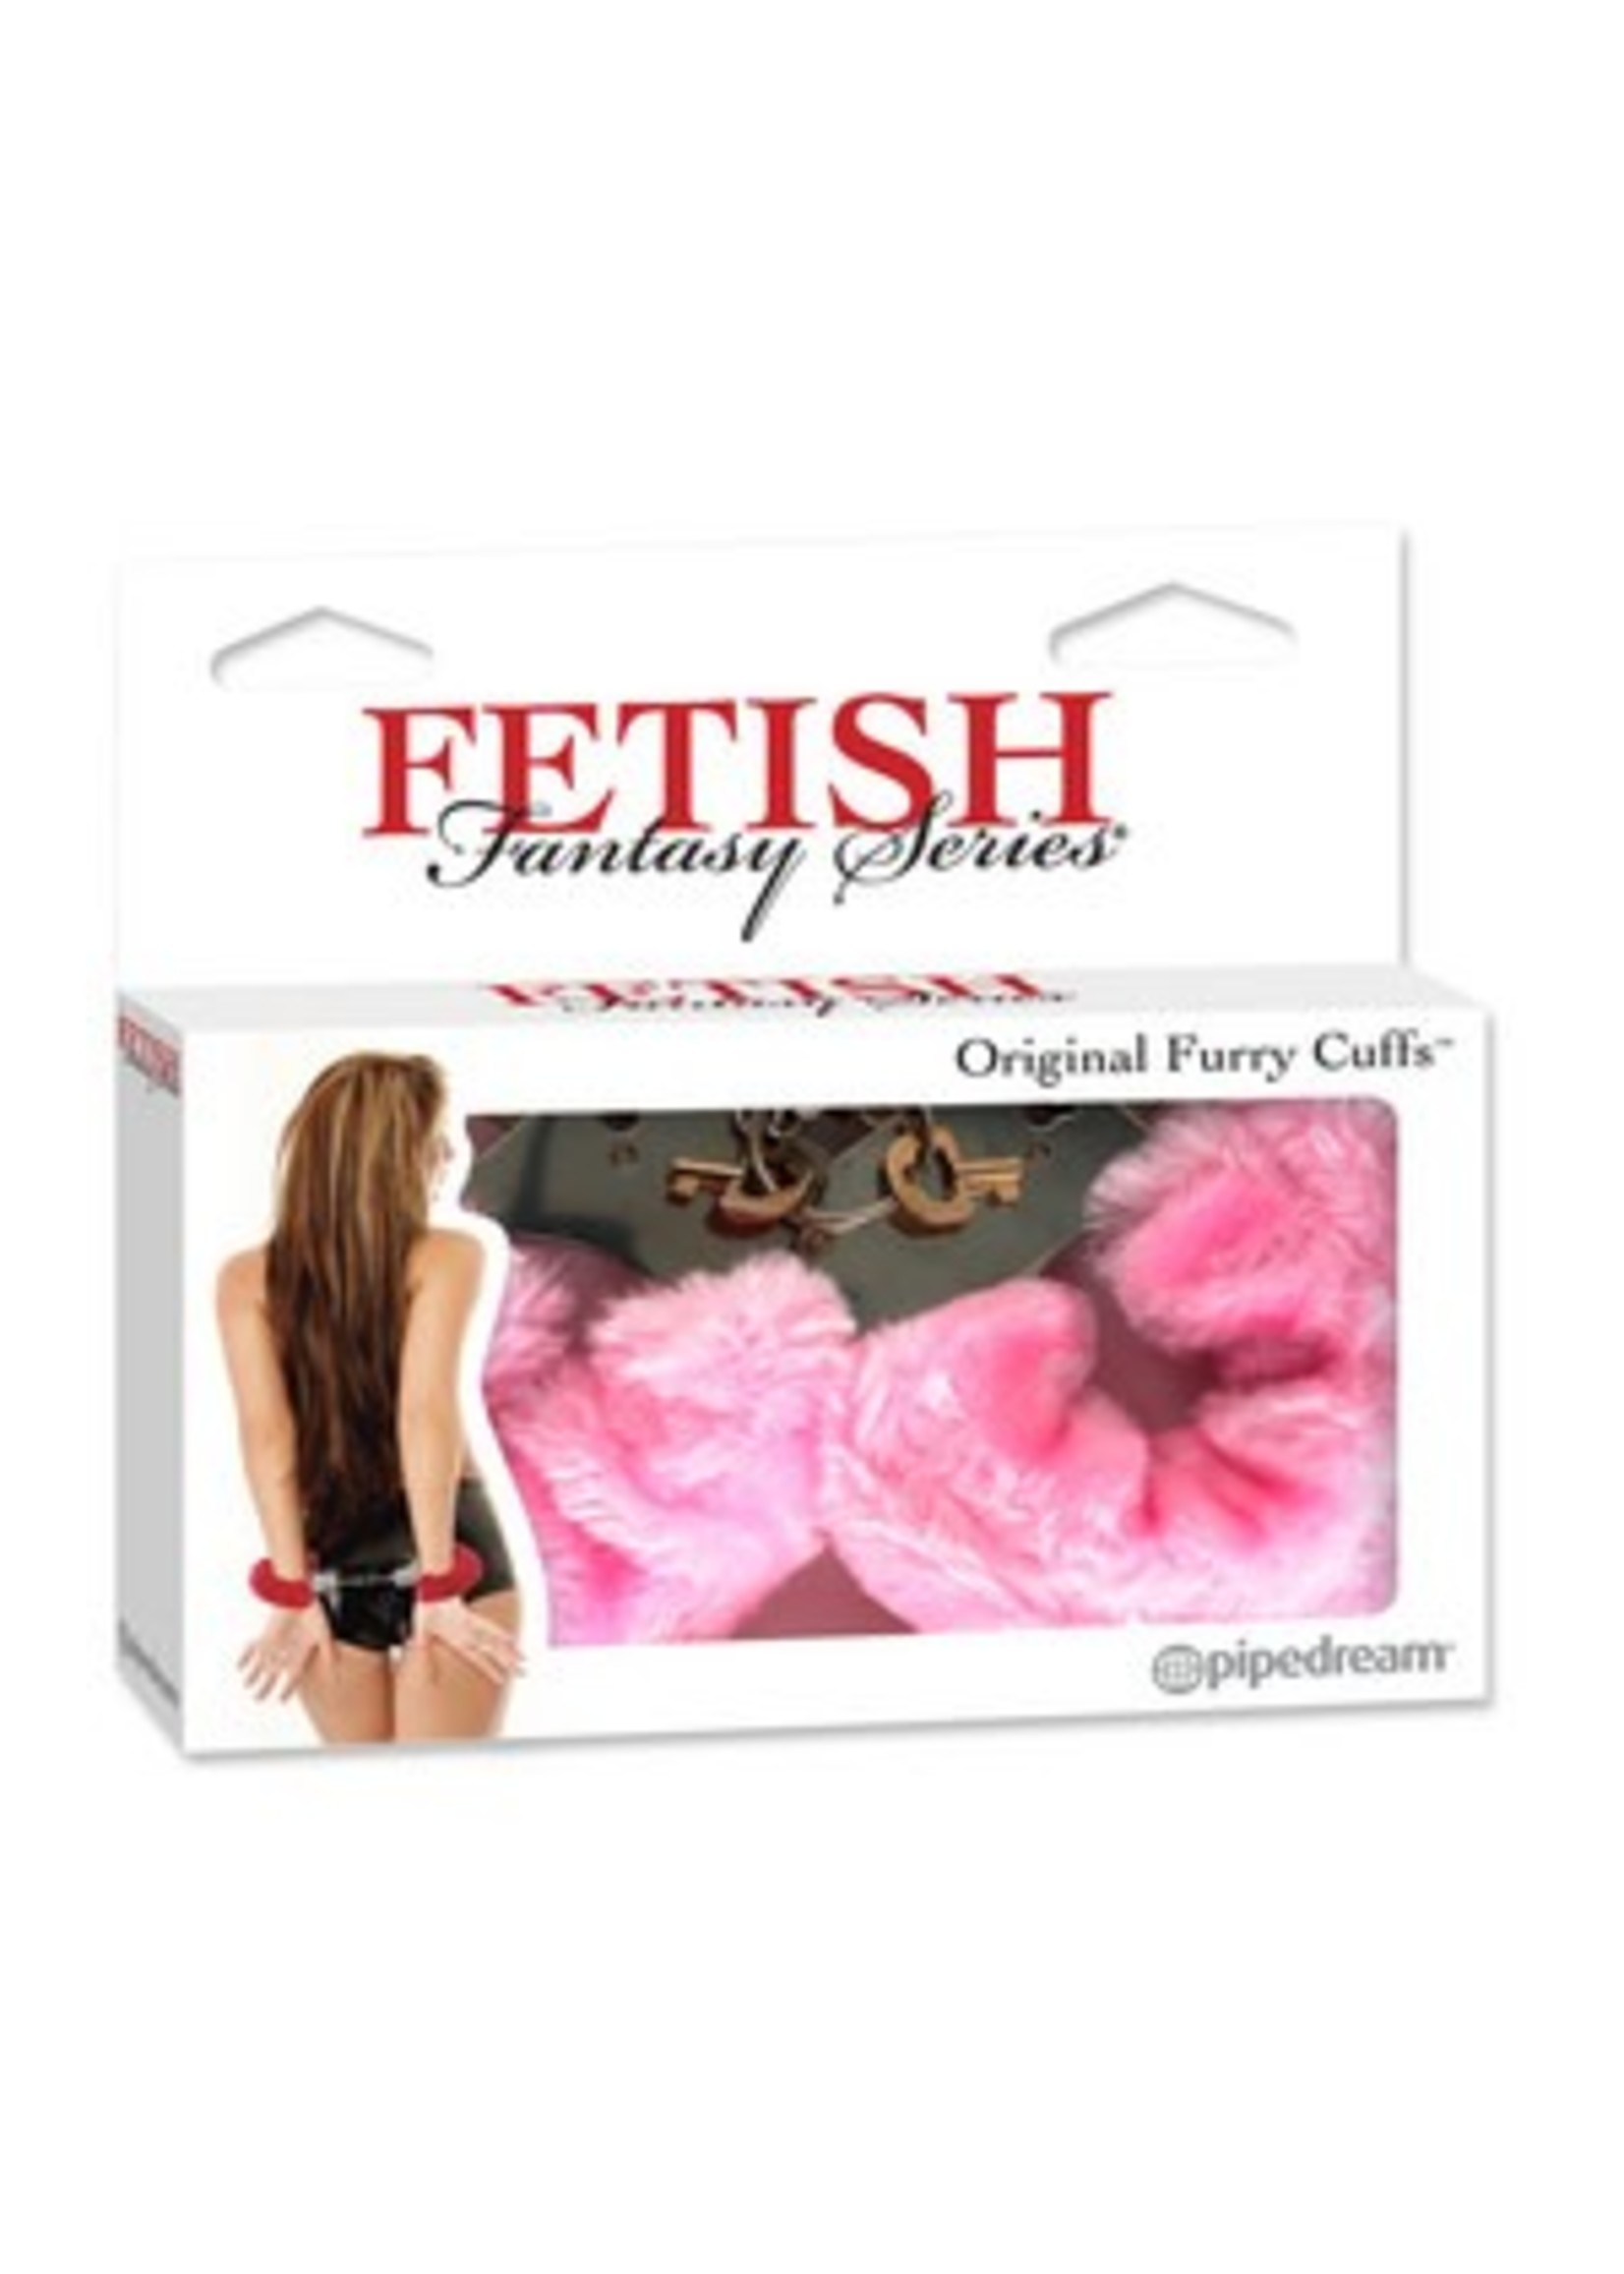 Pipedream Fetish Fantasy Series Original Furry Cuffs-Pink